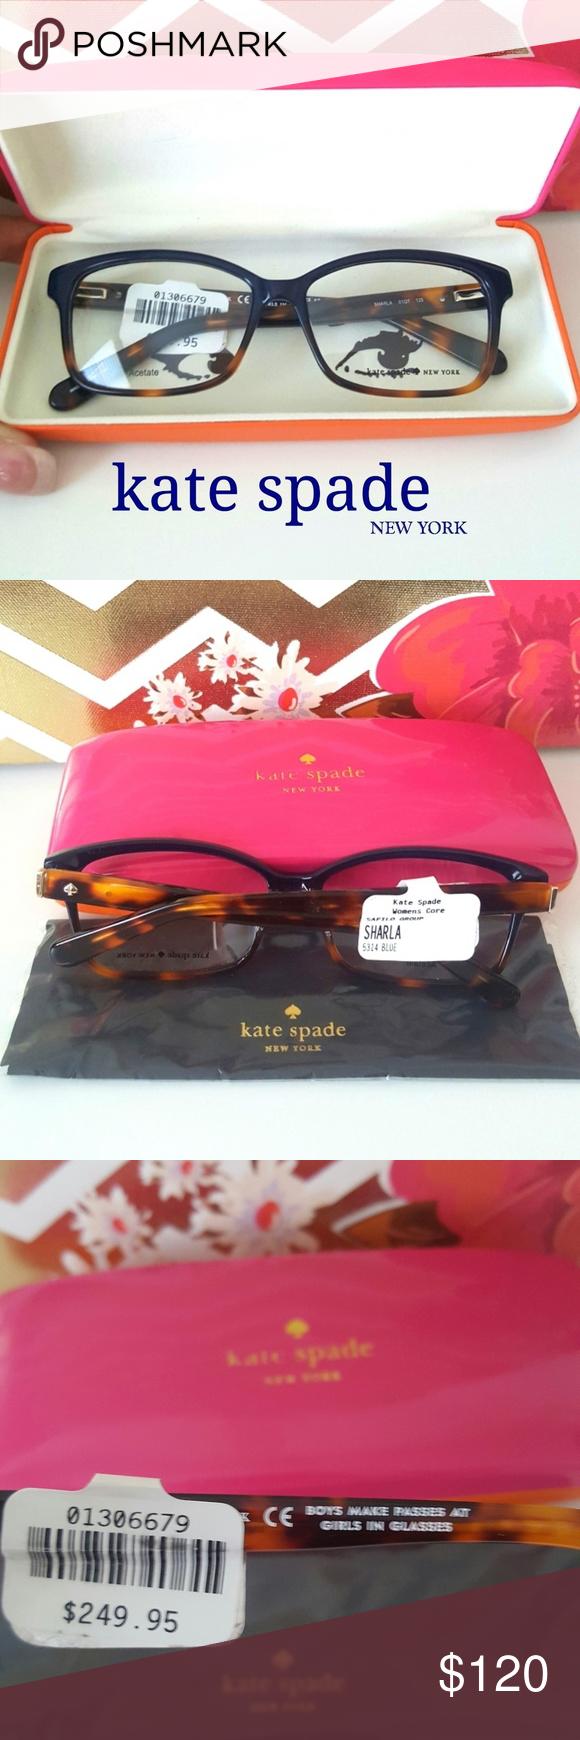 5cce958d06f NEW!! kate spade Rx glasses  blue tortoise  Kate Spade Sharla eyeglasses  boast